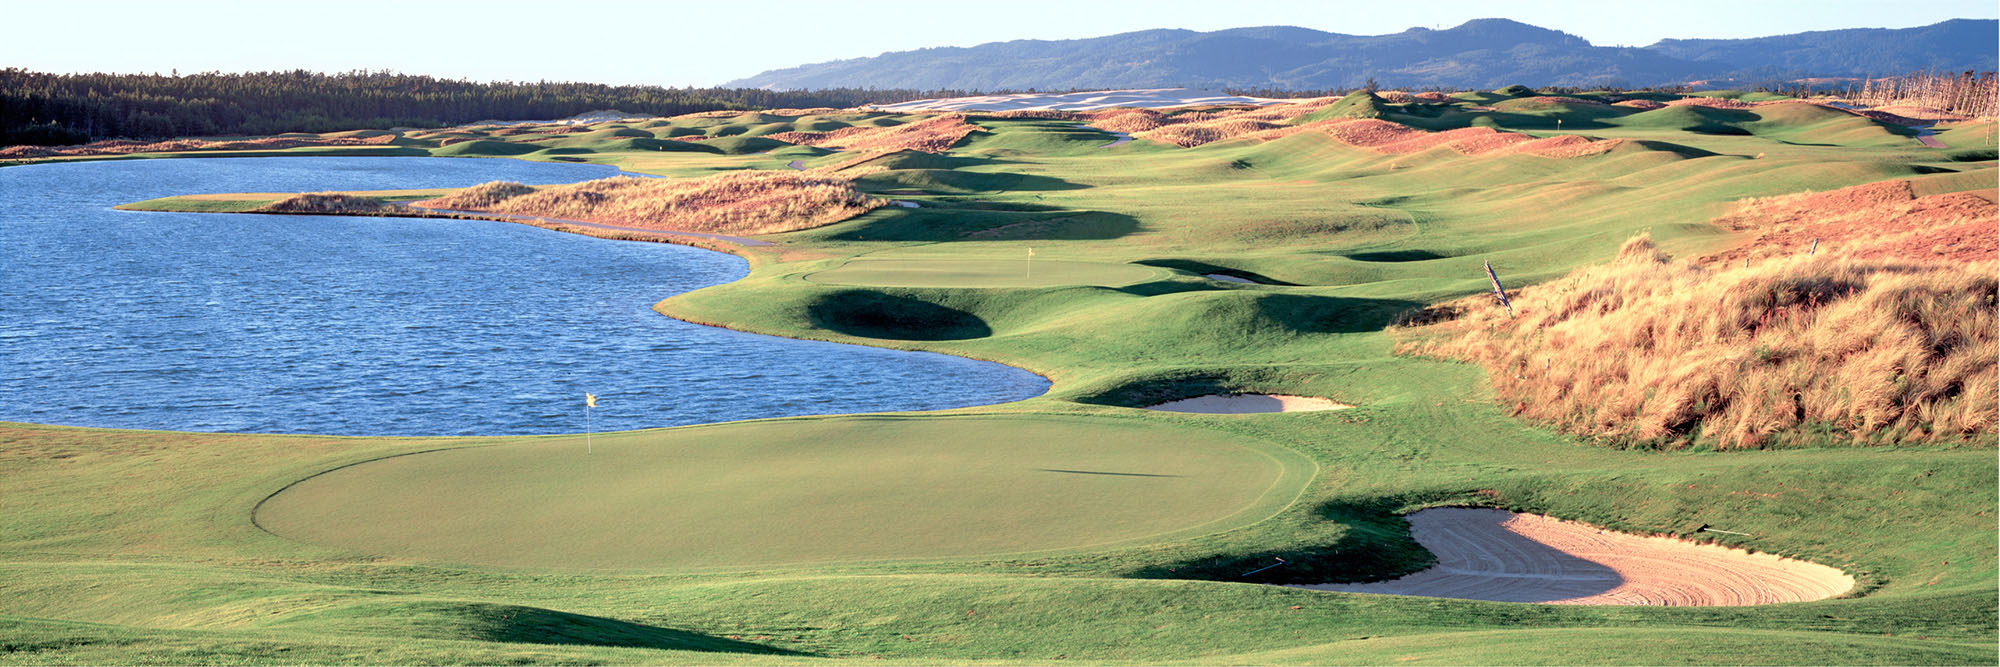 Golf Course Image - Sandpines No. 18